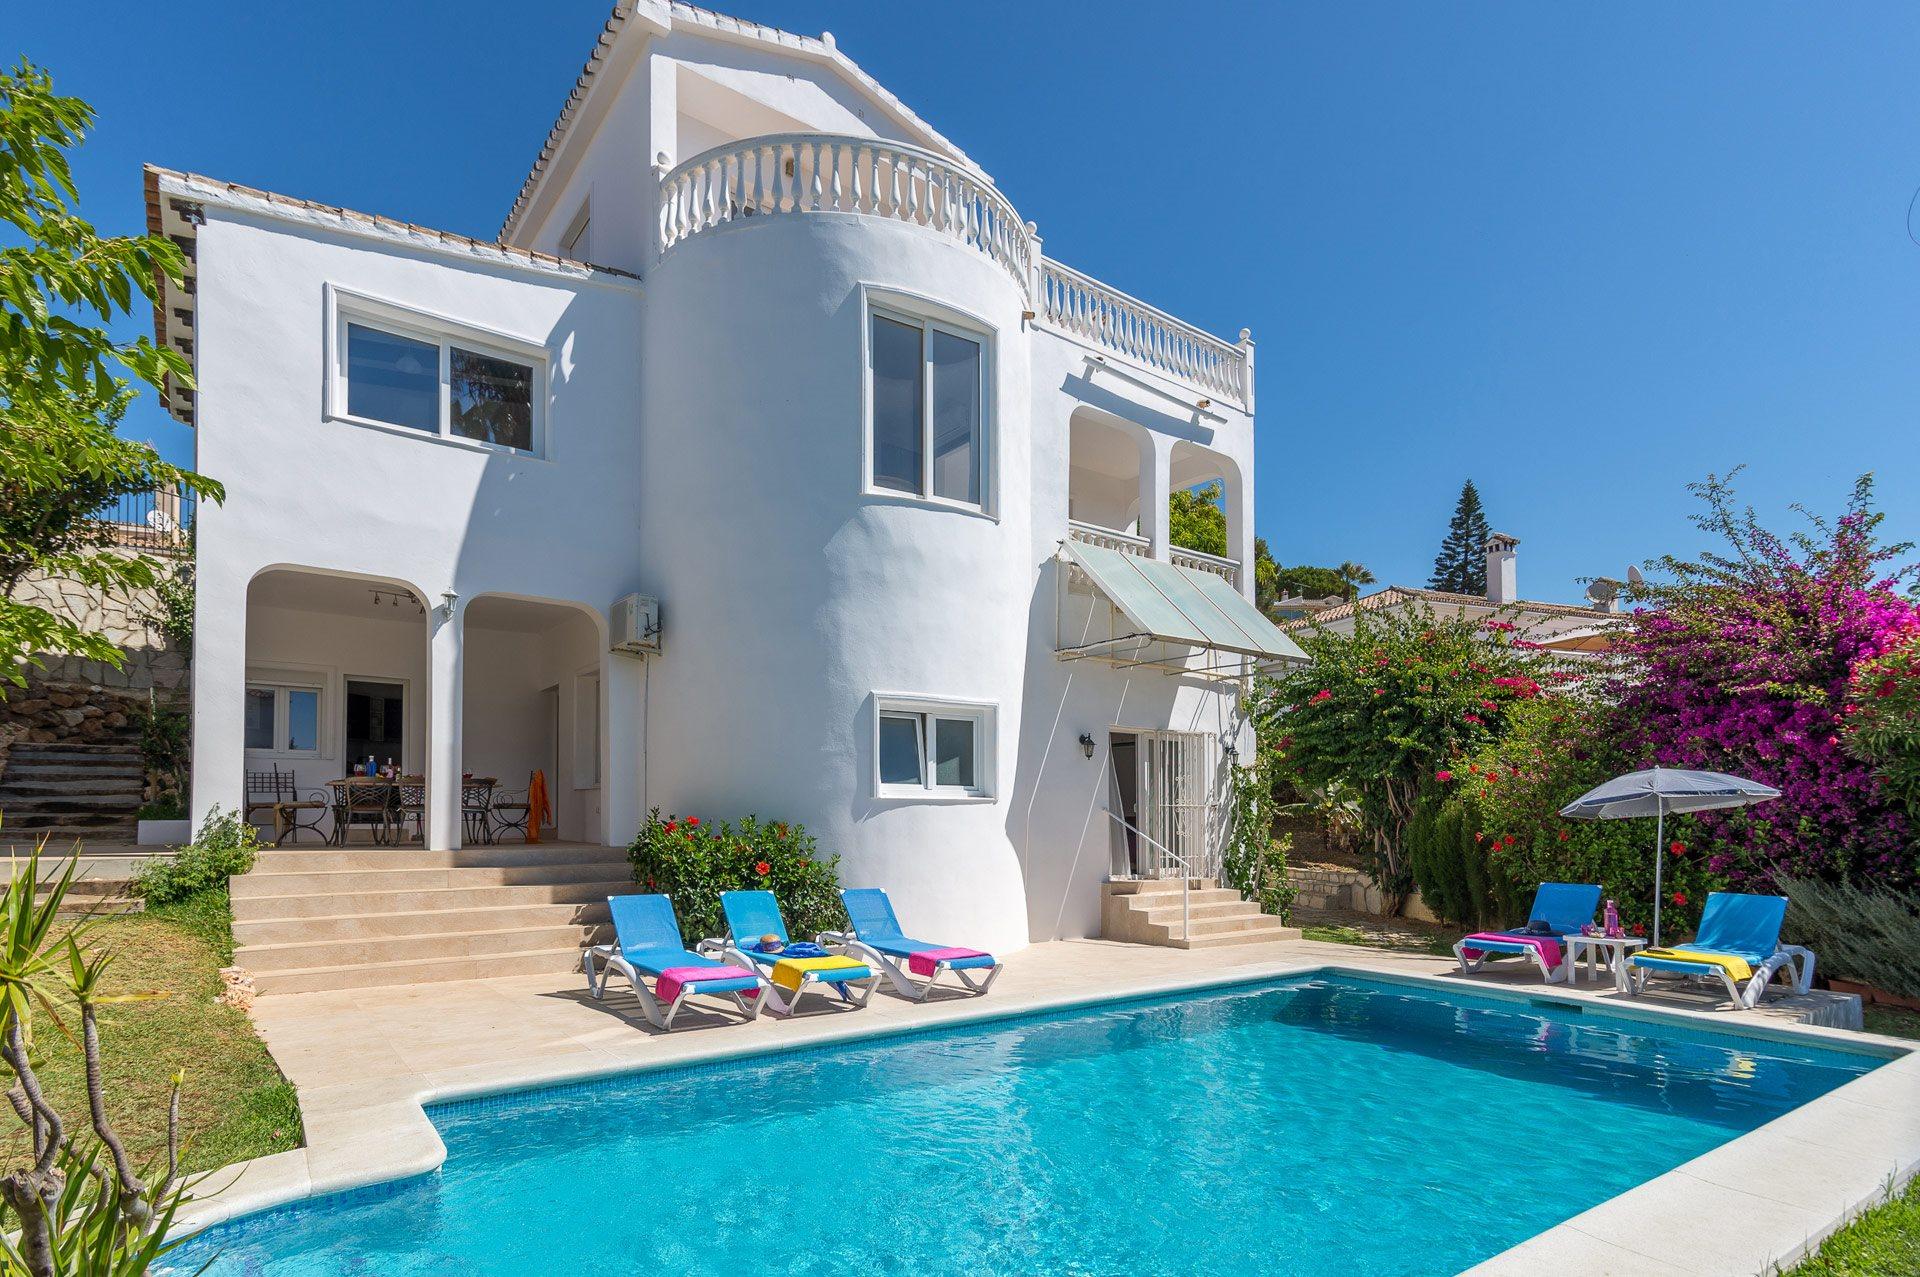 Villa Mariposa Sol, Mijas Costa, Costa del Sol, Spain